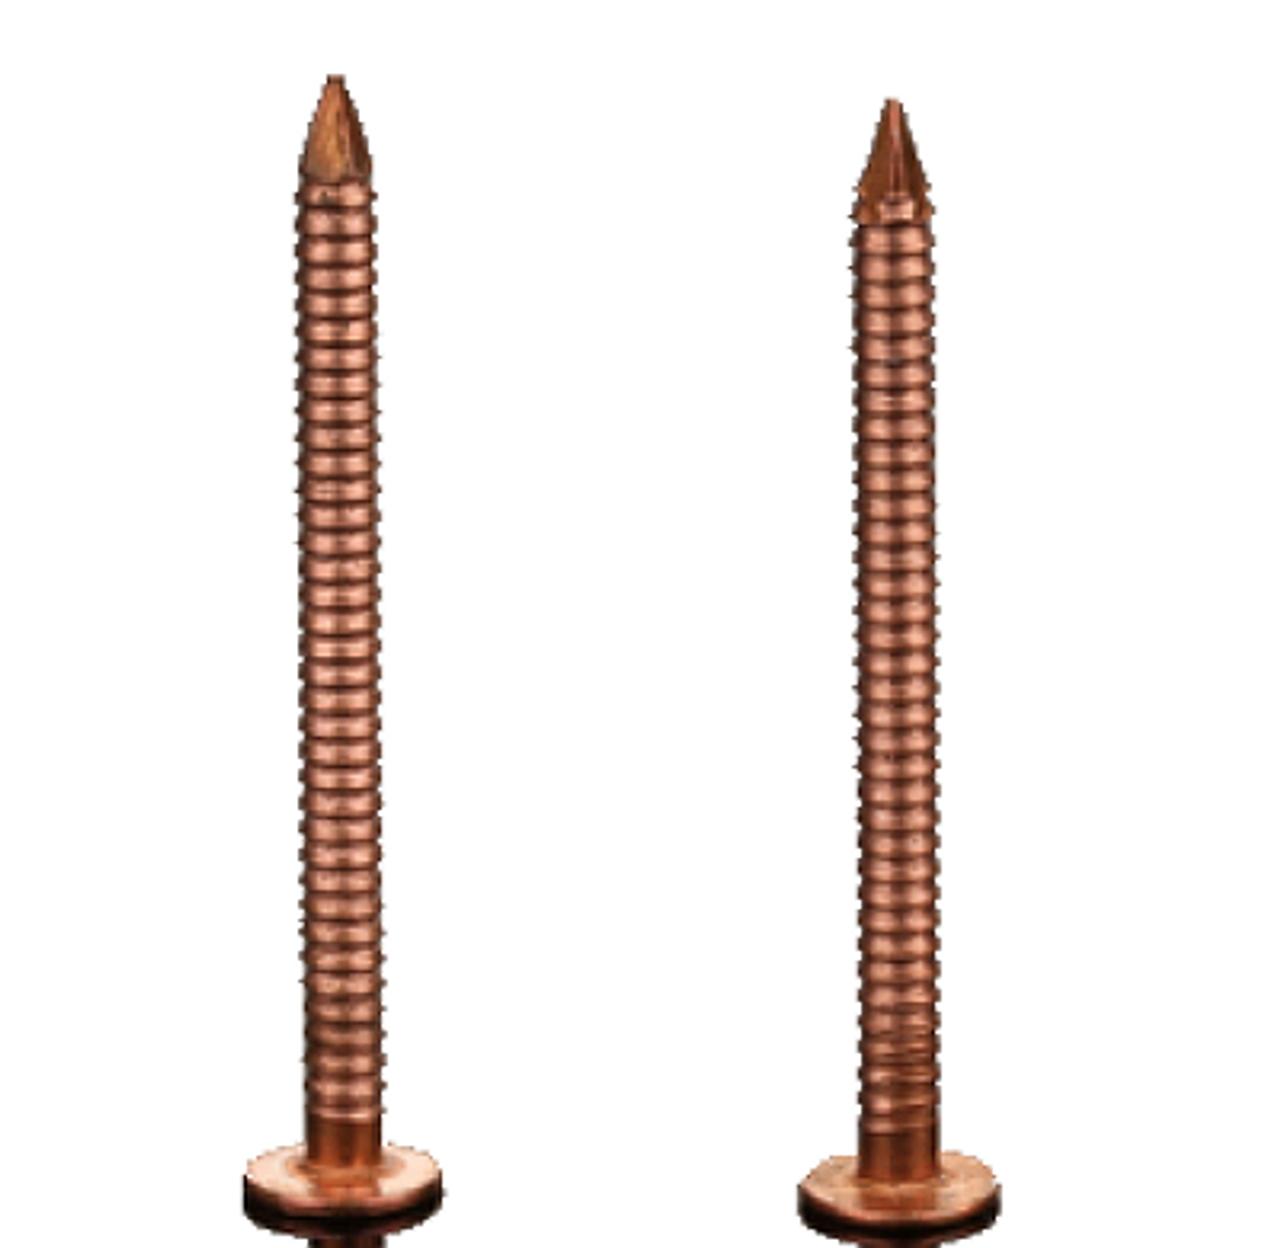 Copper Slating Ring Shank Nail